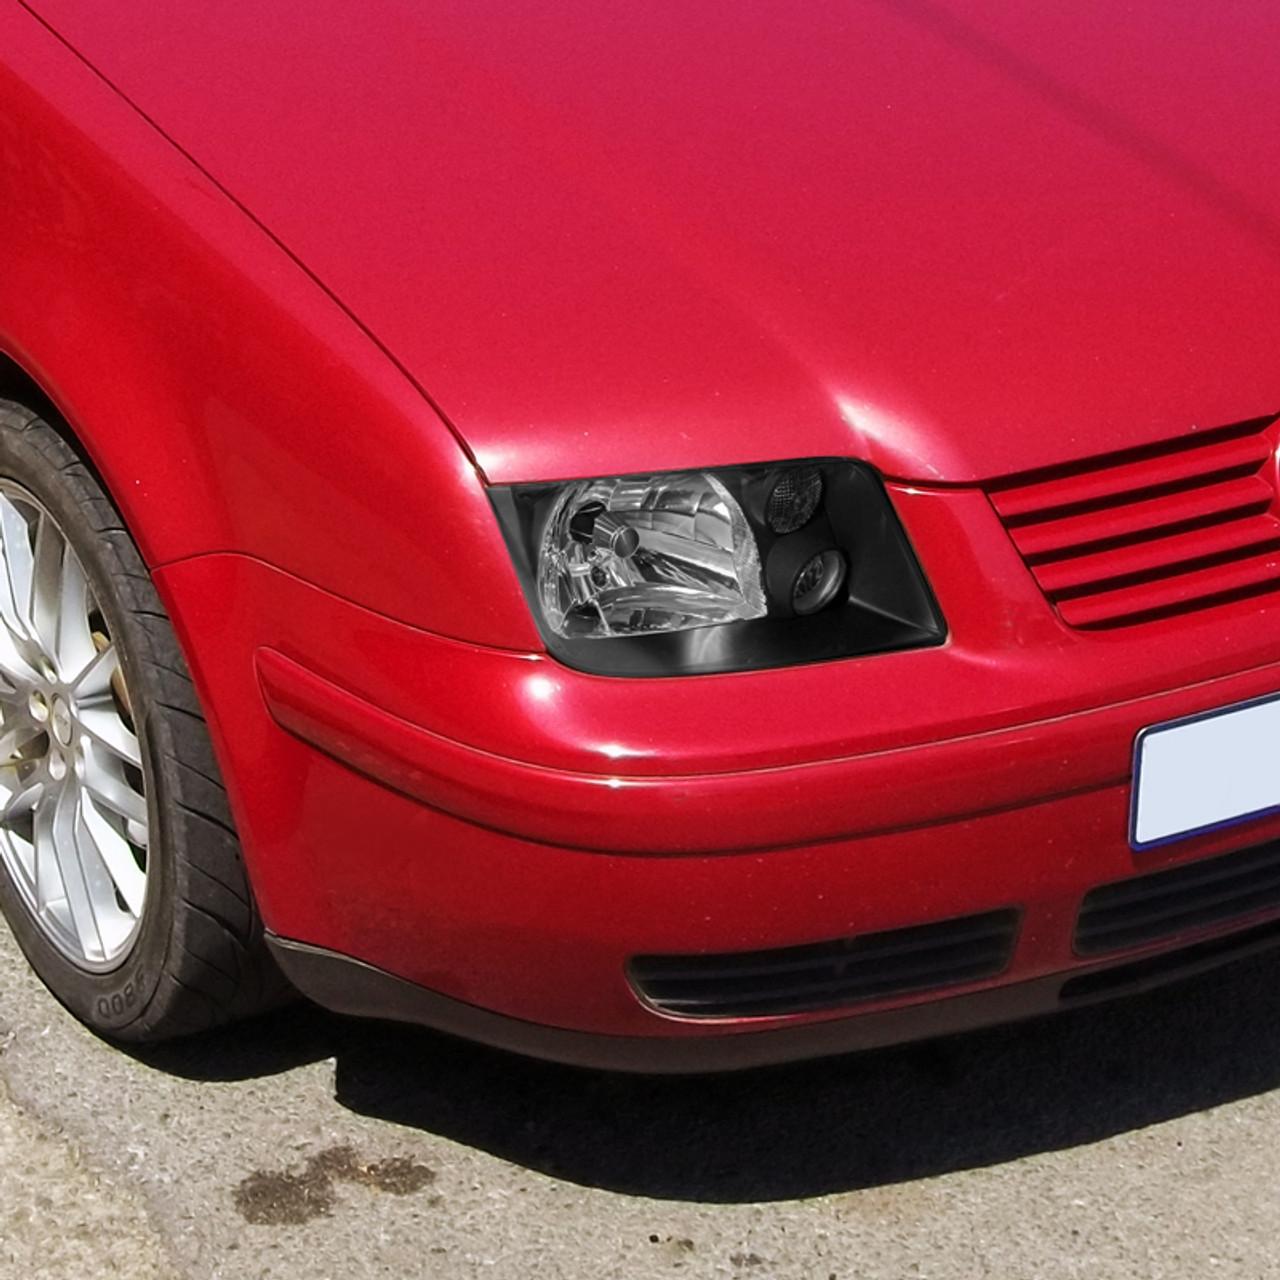 1999 2005 Volkswagen Jetta Mk4 Factory Style Headlight Matte Black Housing Clear Lens Spec D Tuning